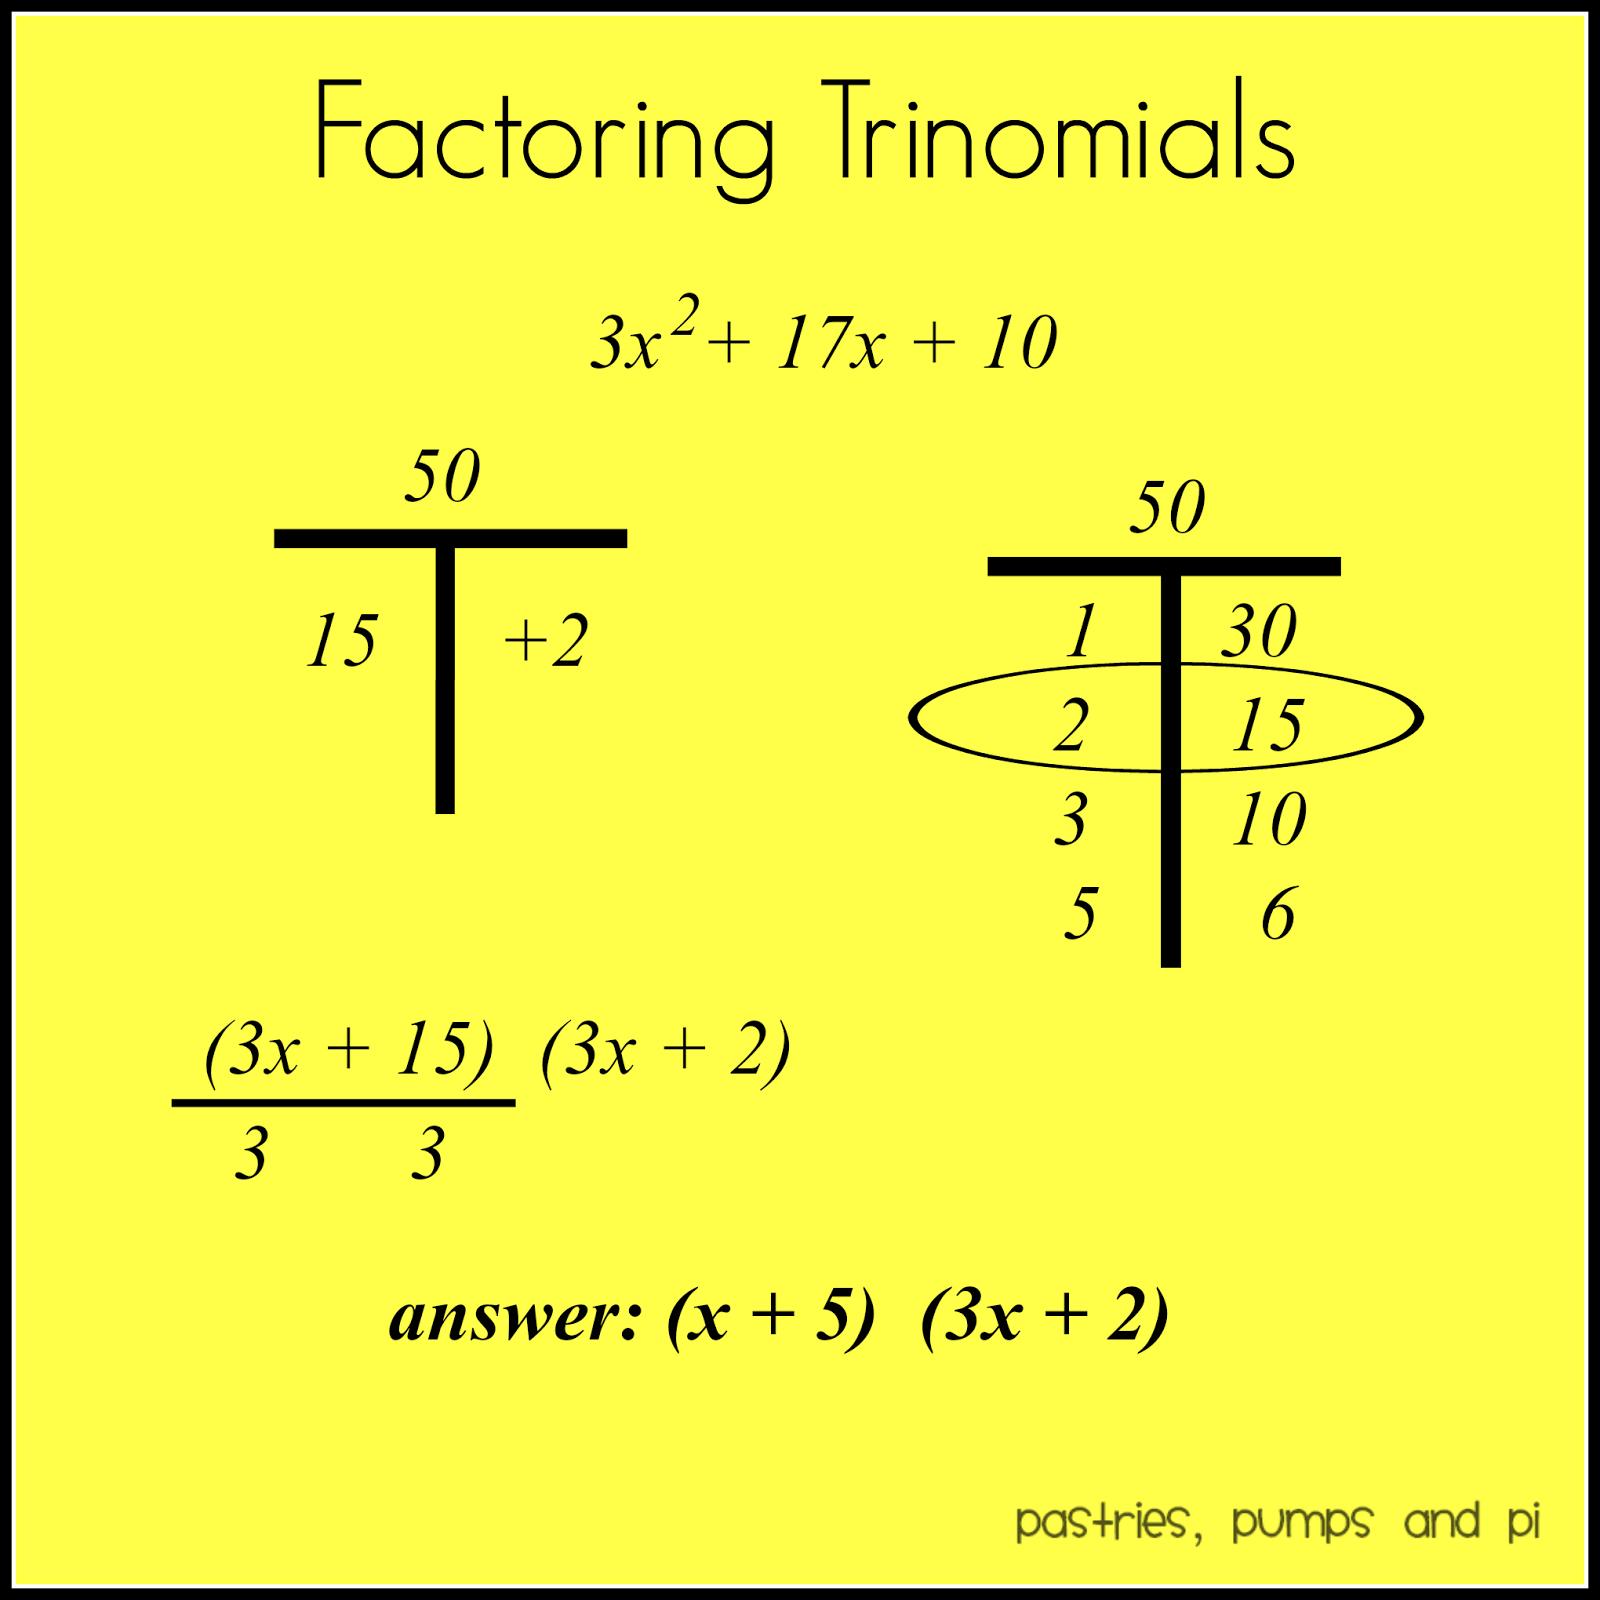 factoring trinomials homework help